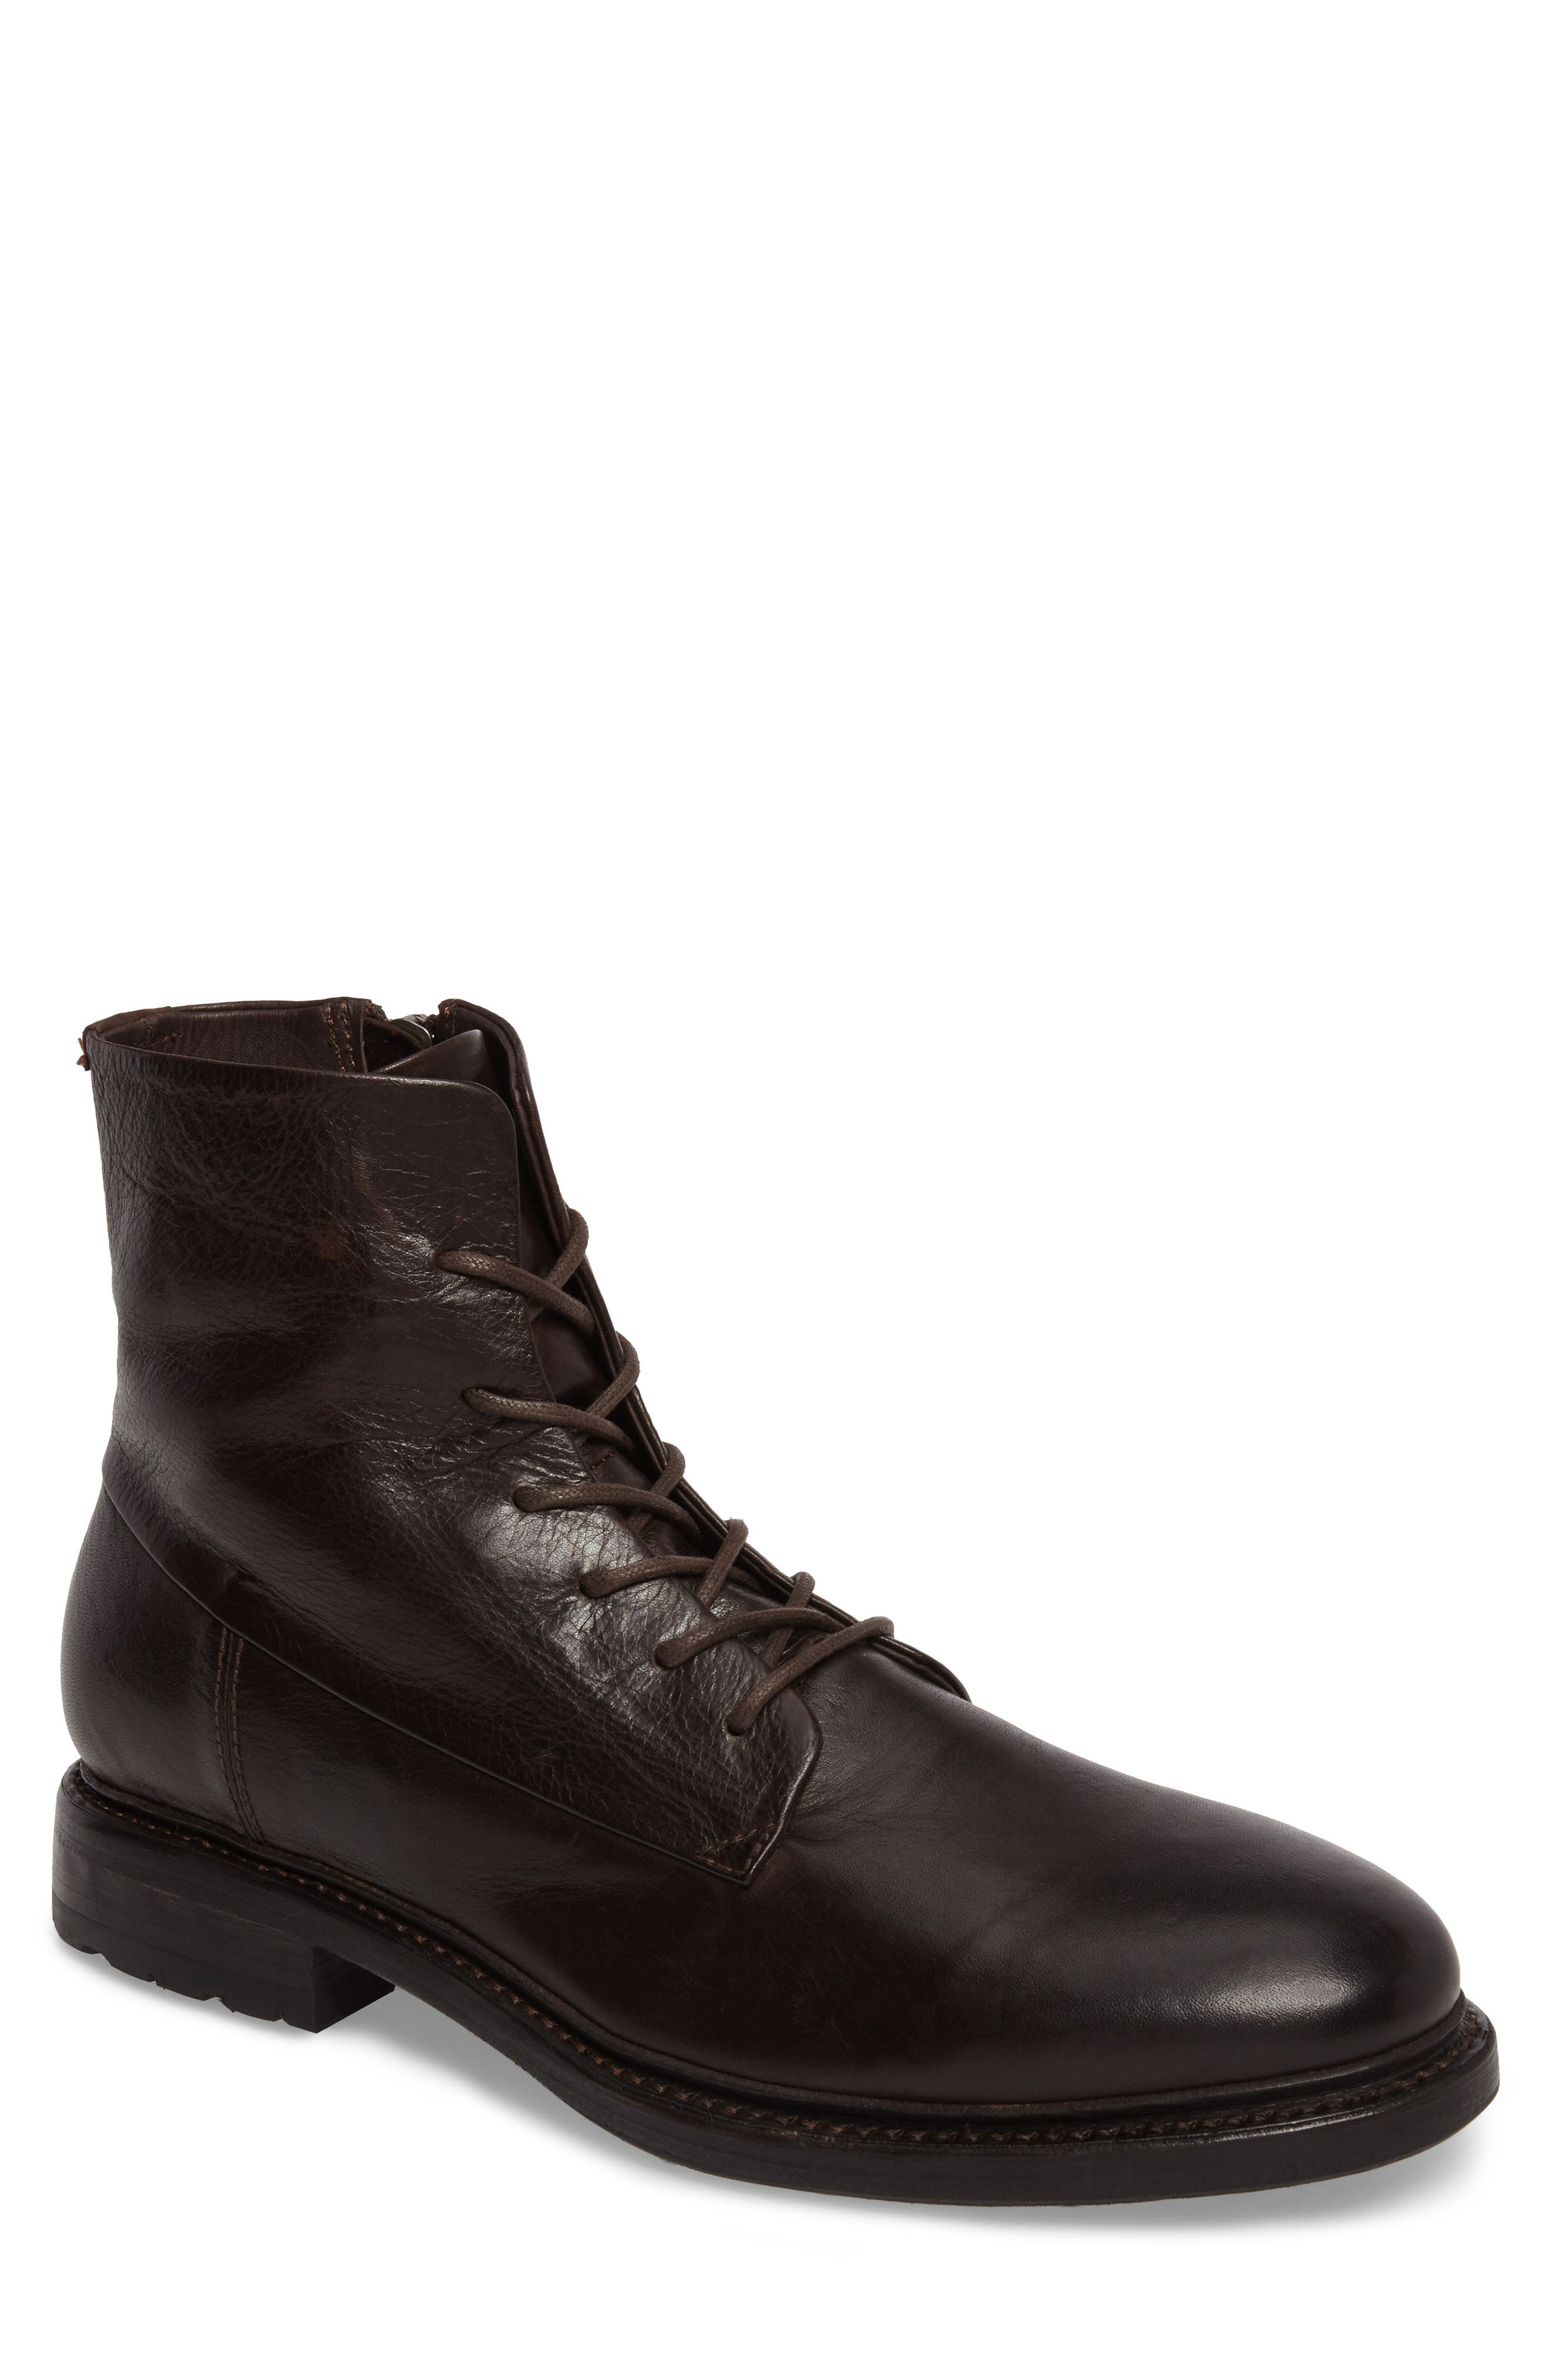 Main Image - Blackstone MM 08 Plain Toe Boot (Men)